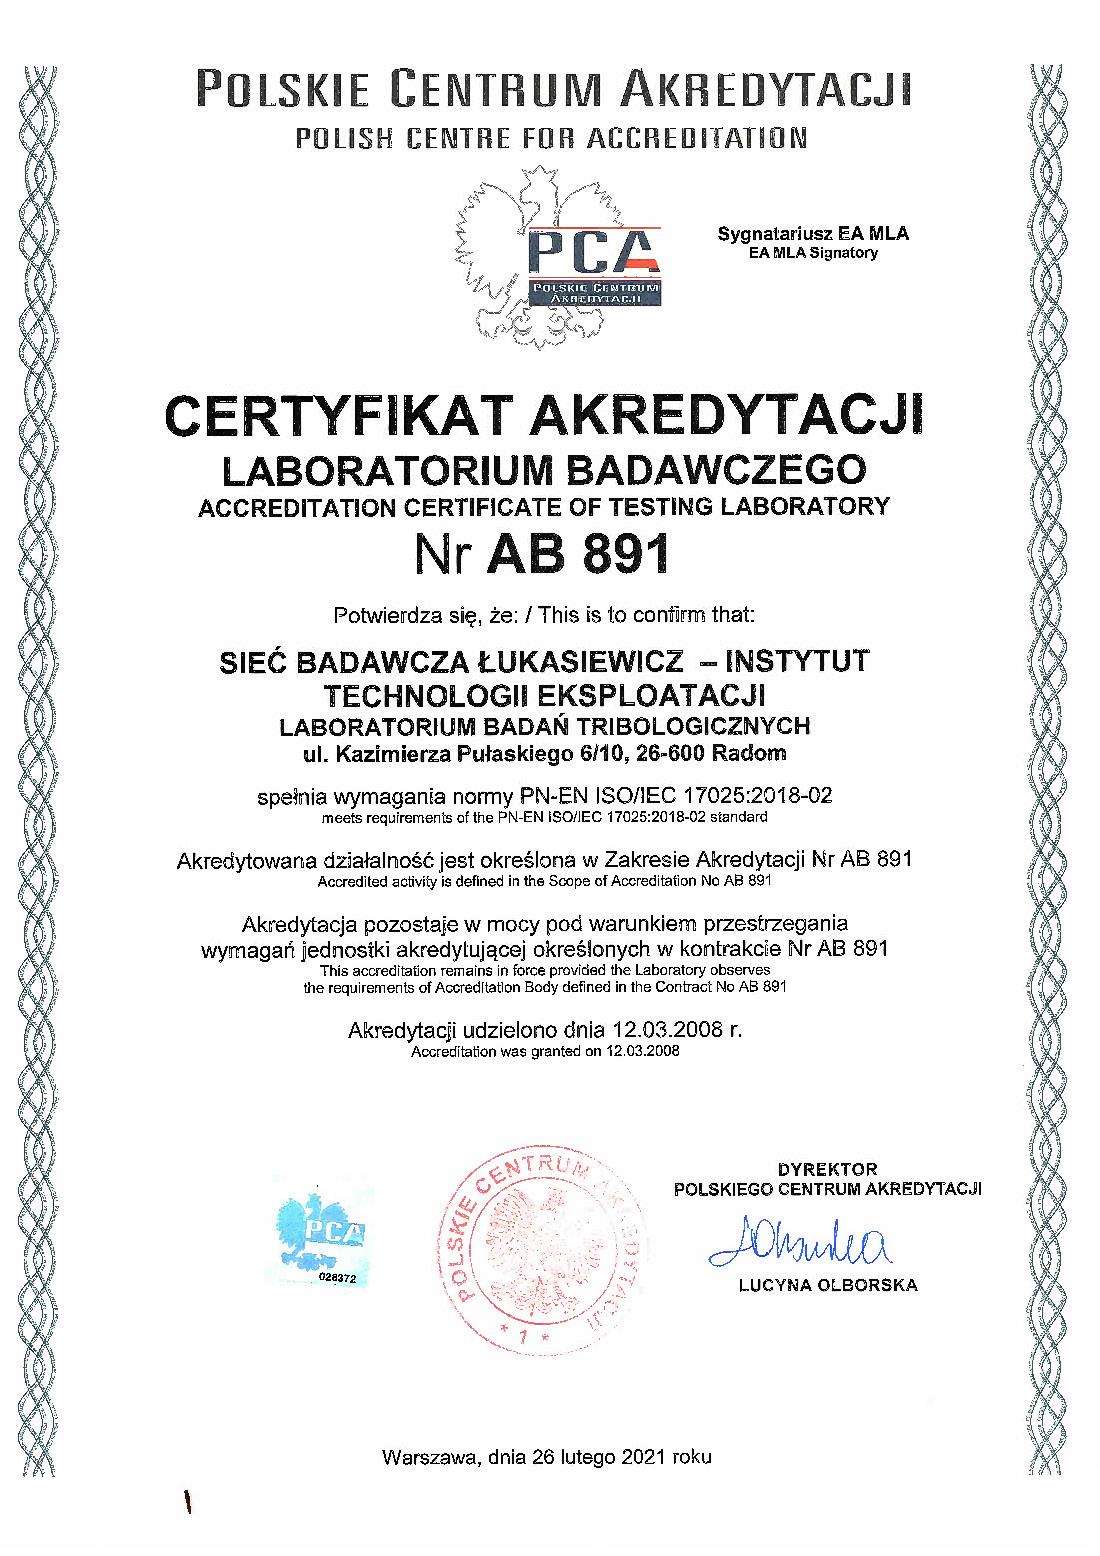 ab 891 certyfikat